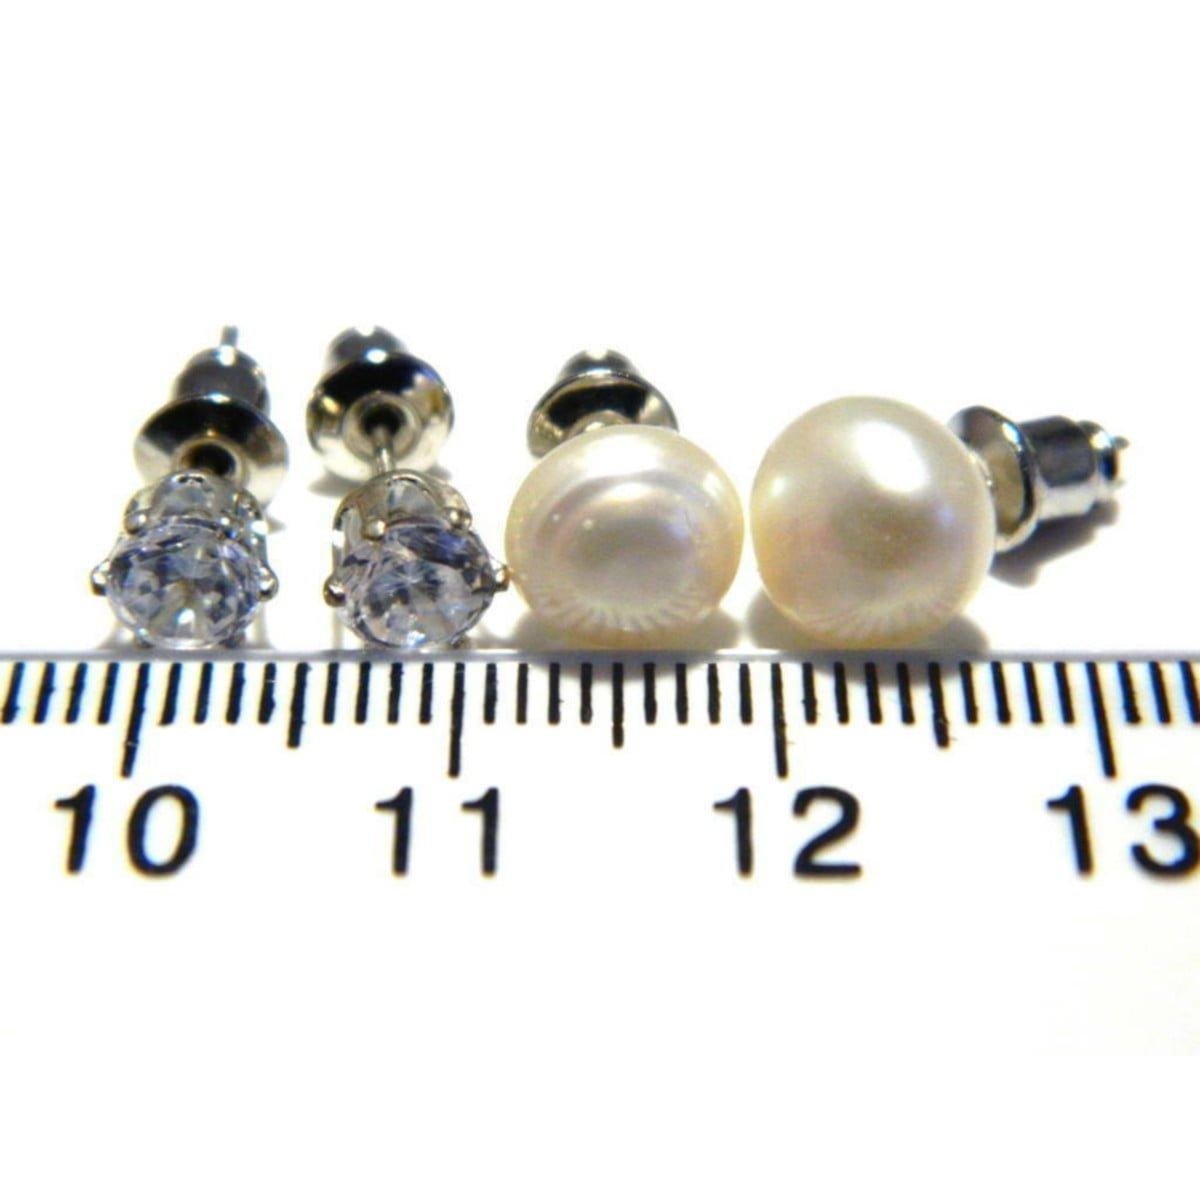 Crystal and pearl stud earrings in silver plate ruler